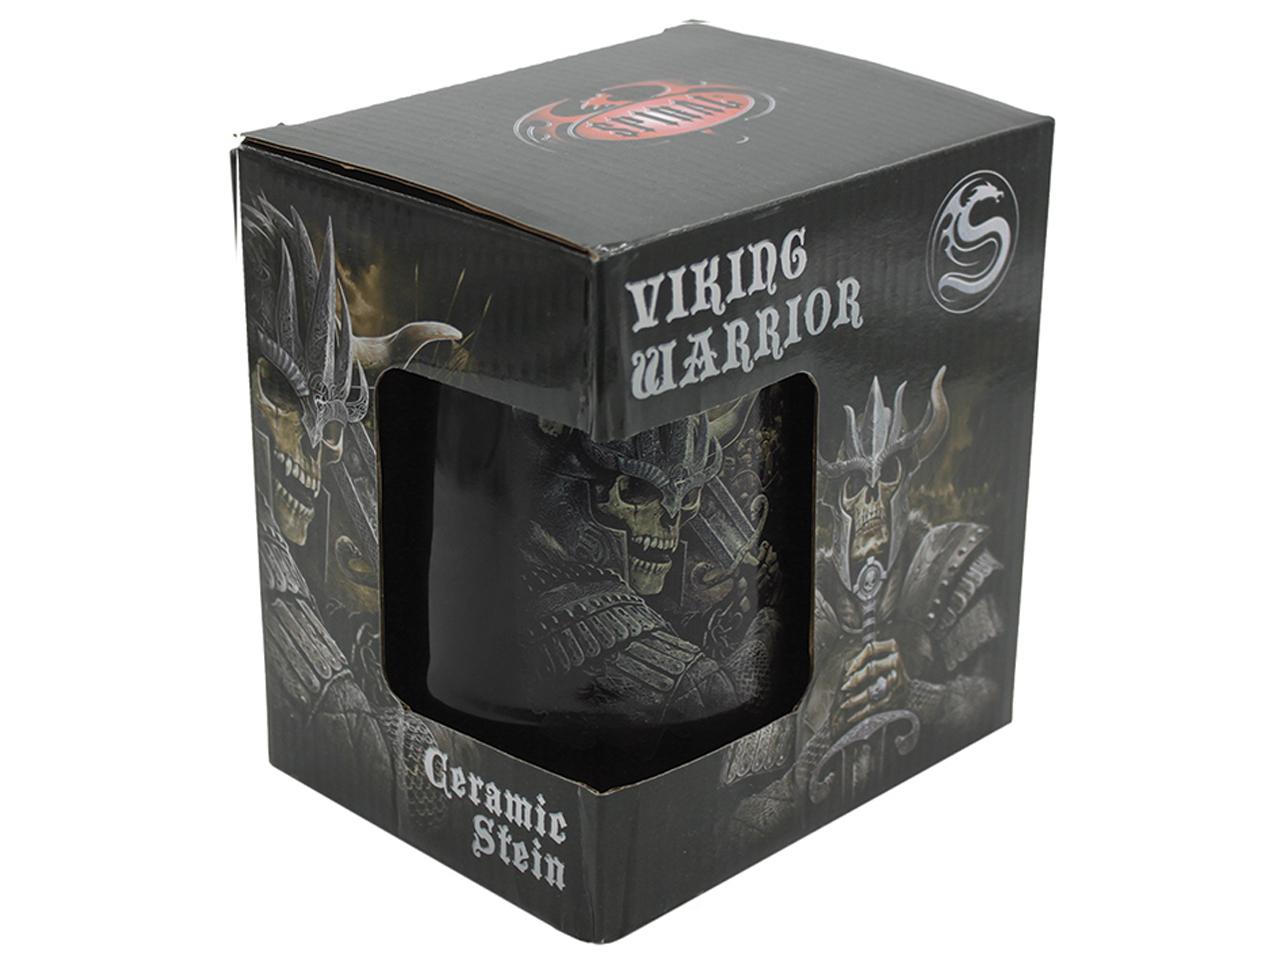 Spiral Viking Warrior Ceramic Stein Mug Skeleton King Skull Reaper Tankard Pyramid International